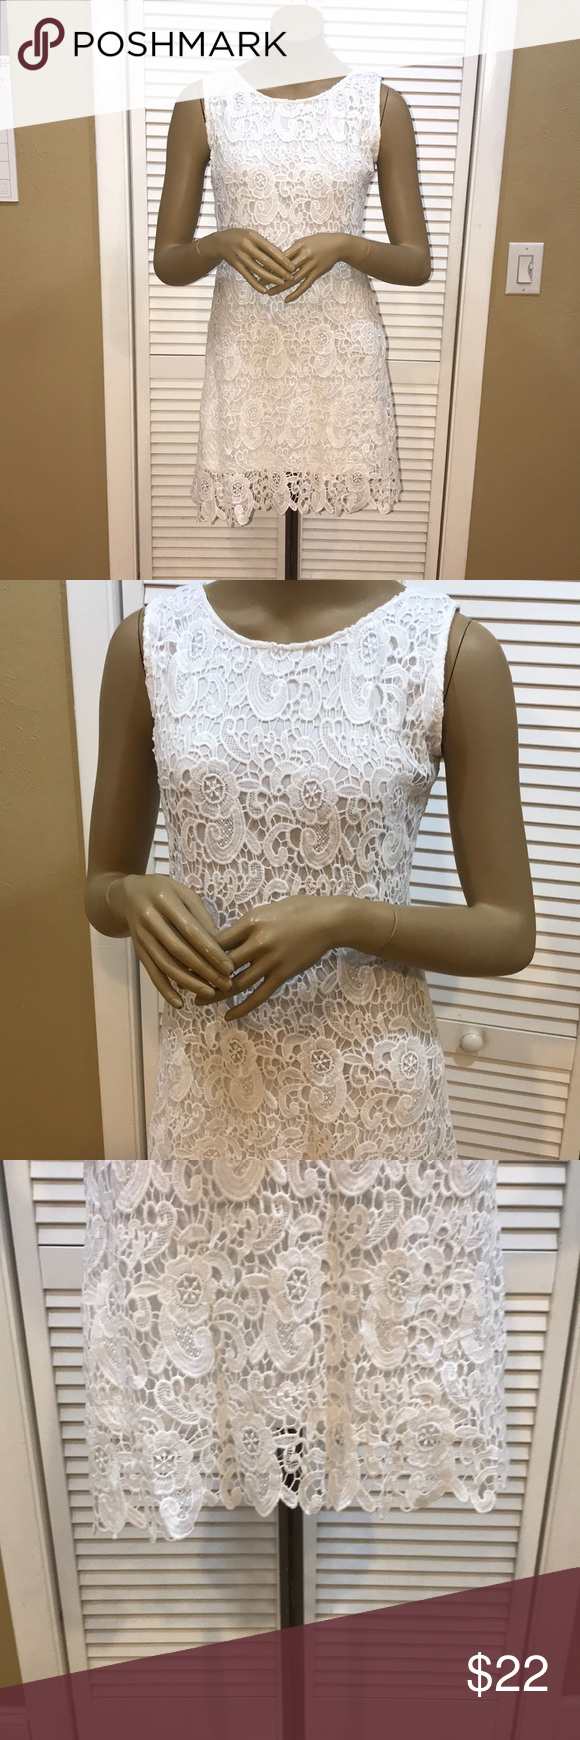 Blanc Du Nil White Lace Dress Lace White Dress Lace Dress Dresses [ 1740 x 580 Pixel ]